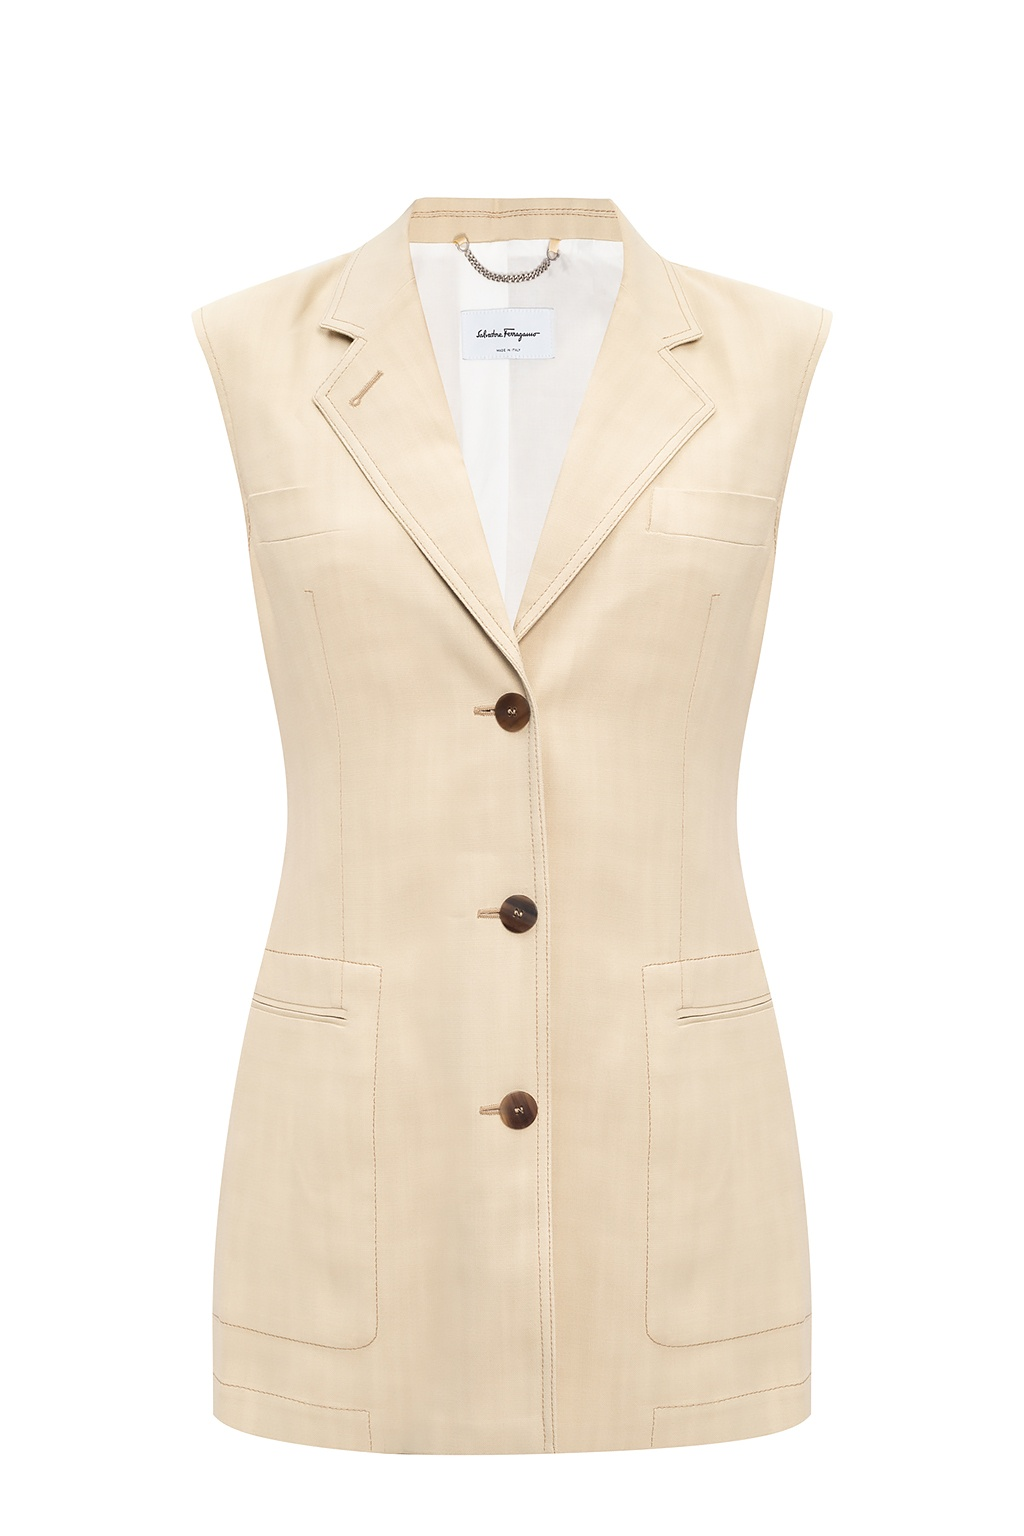 Salvatore Ferragamo Vest with pockets